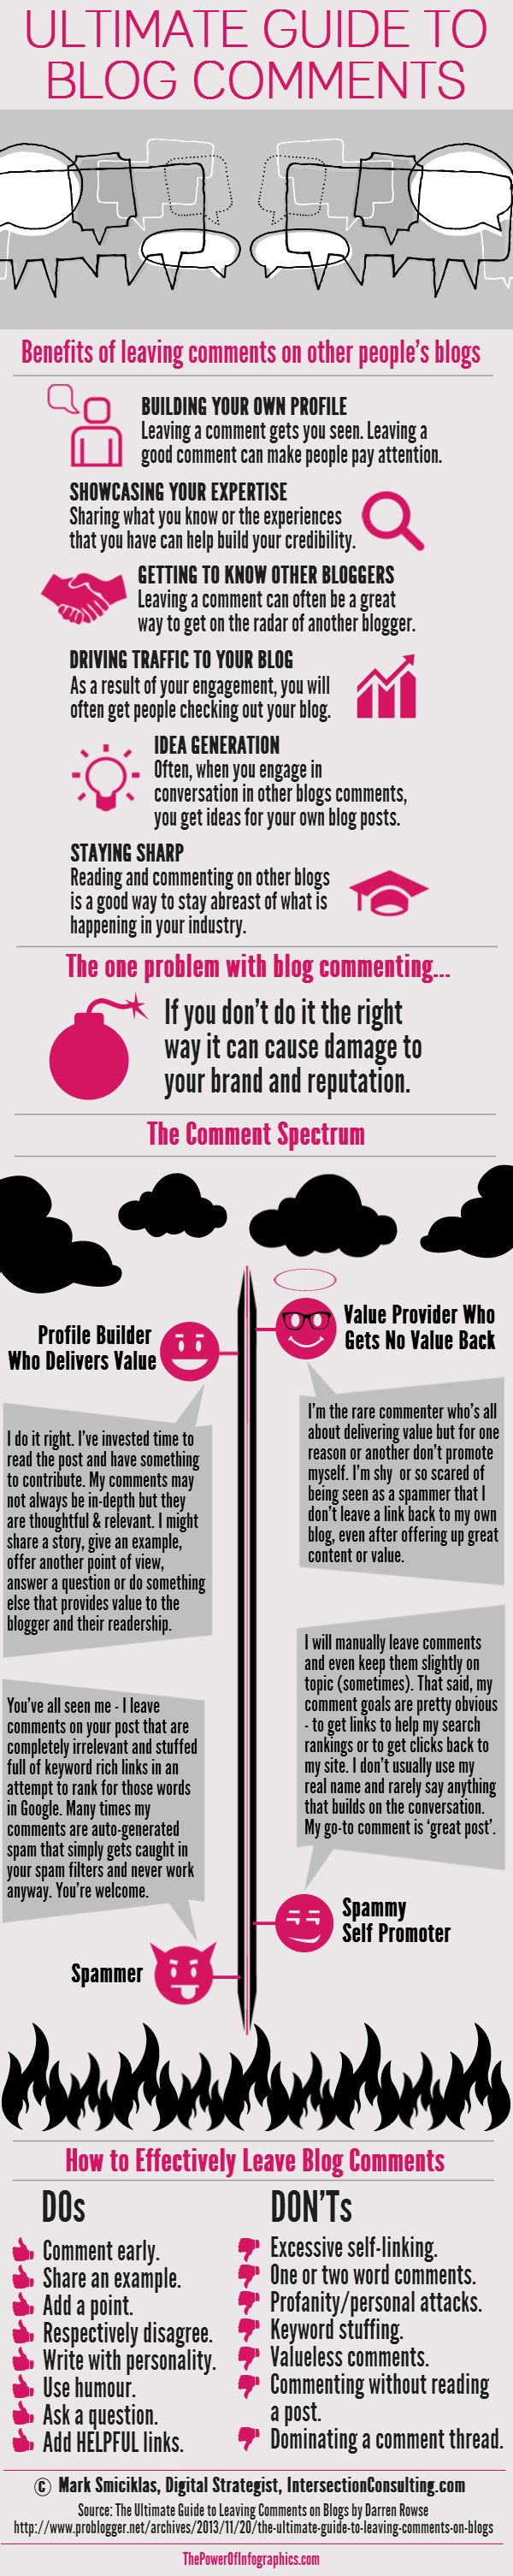 The Ultimate Blog Comments Guide www.socialmediamamma.com Blogging Infographic